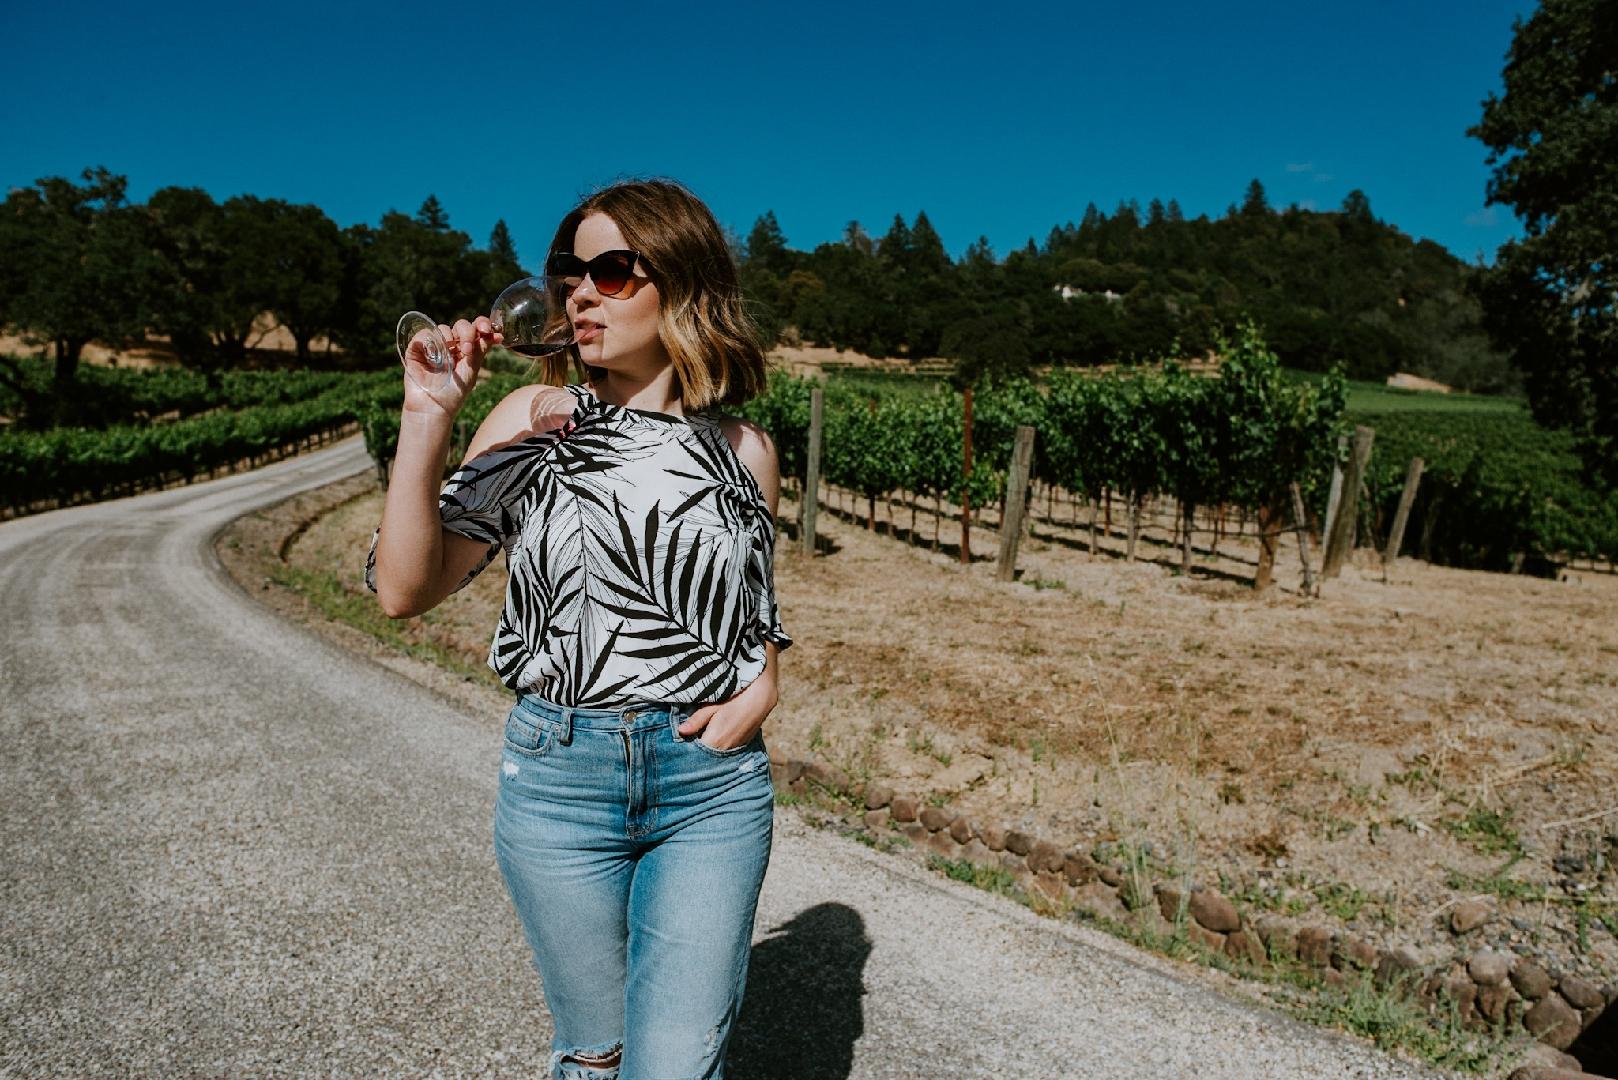 Medlock Ames Winery Sonoma County